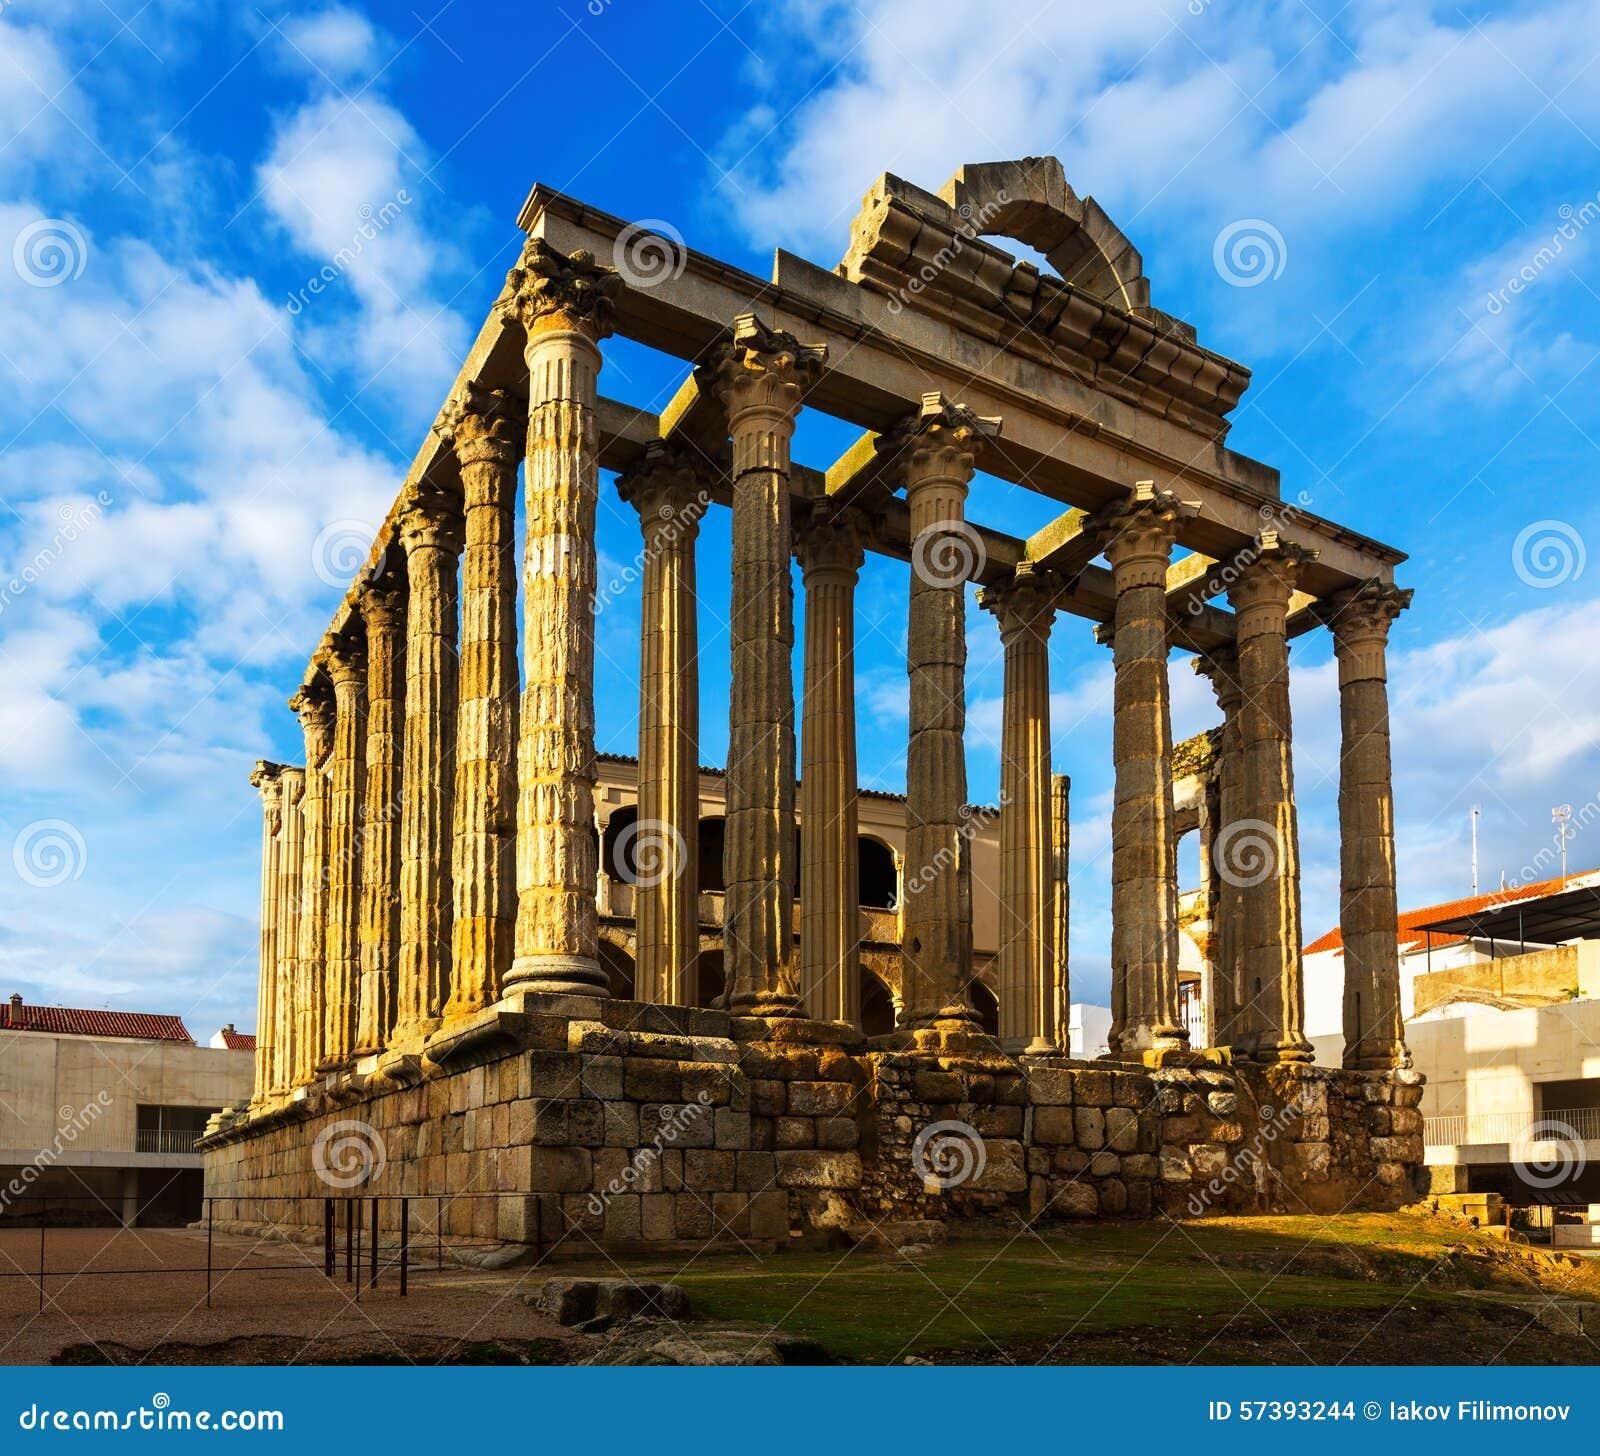 Tempel van Diana in Merida, Spanje